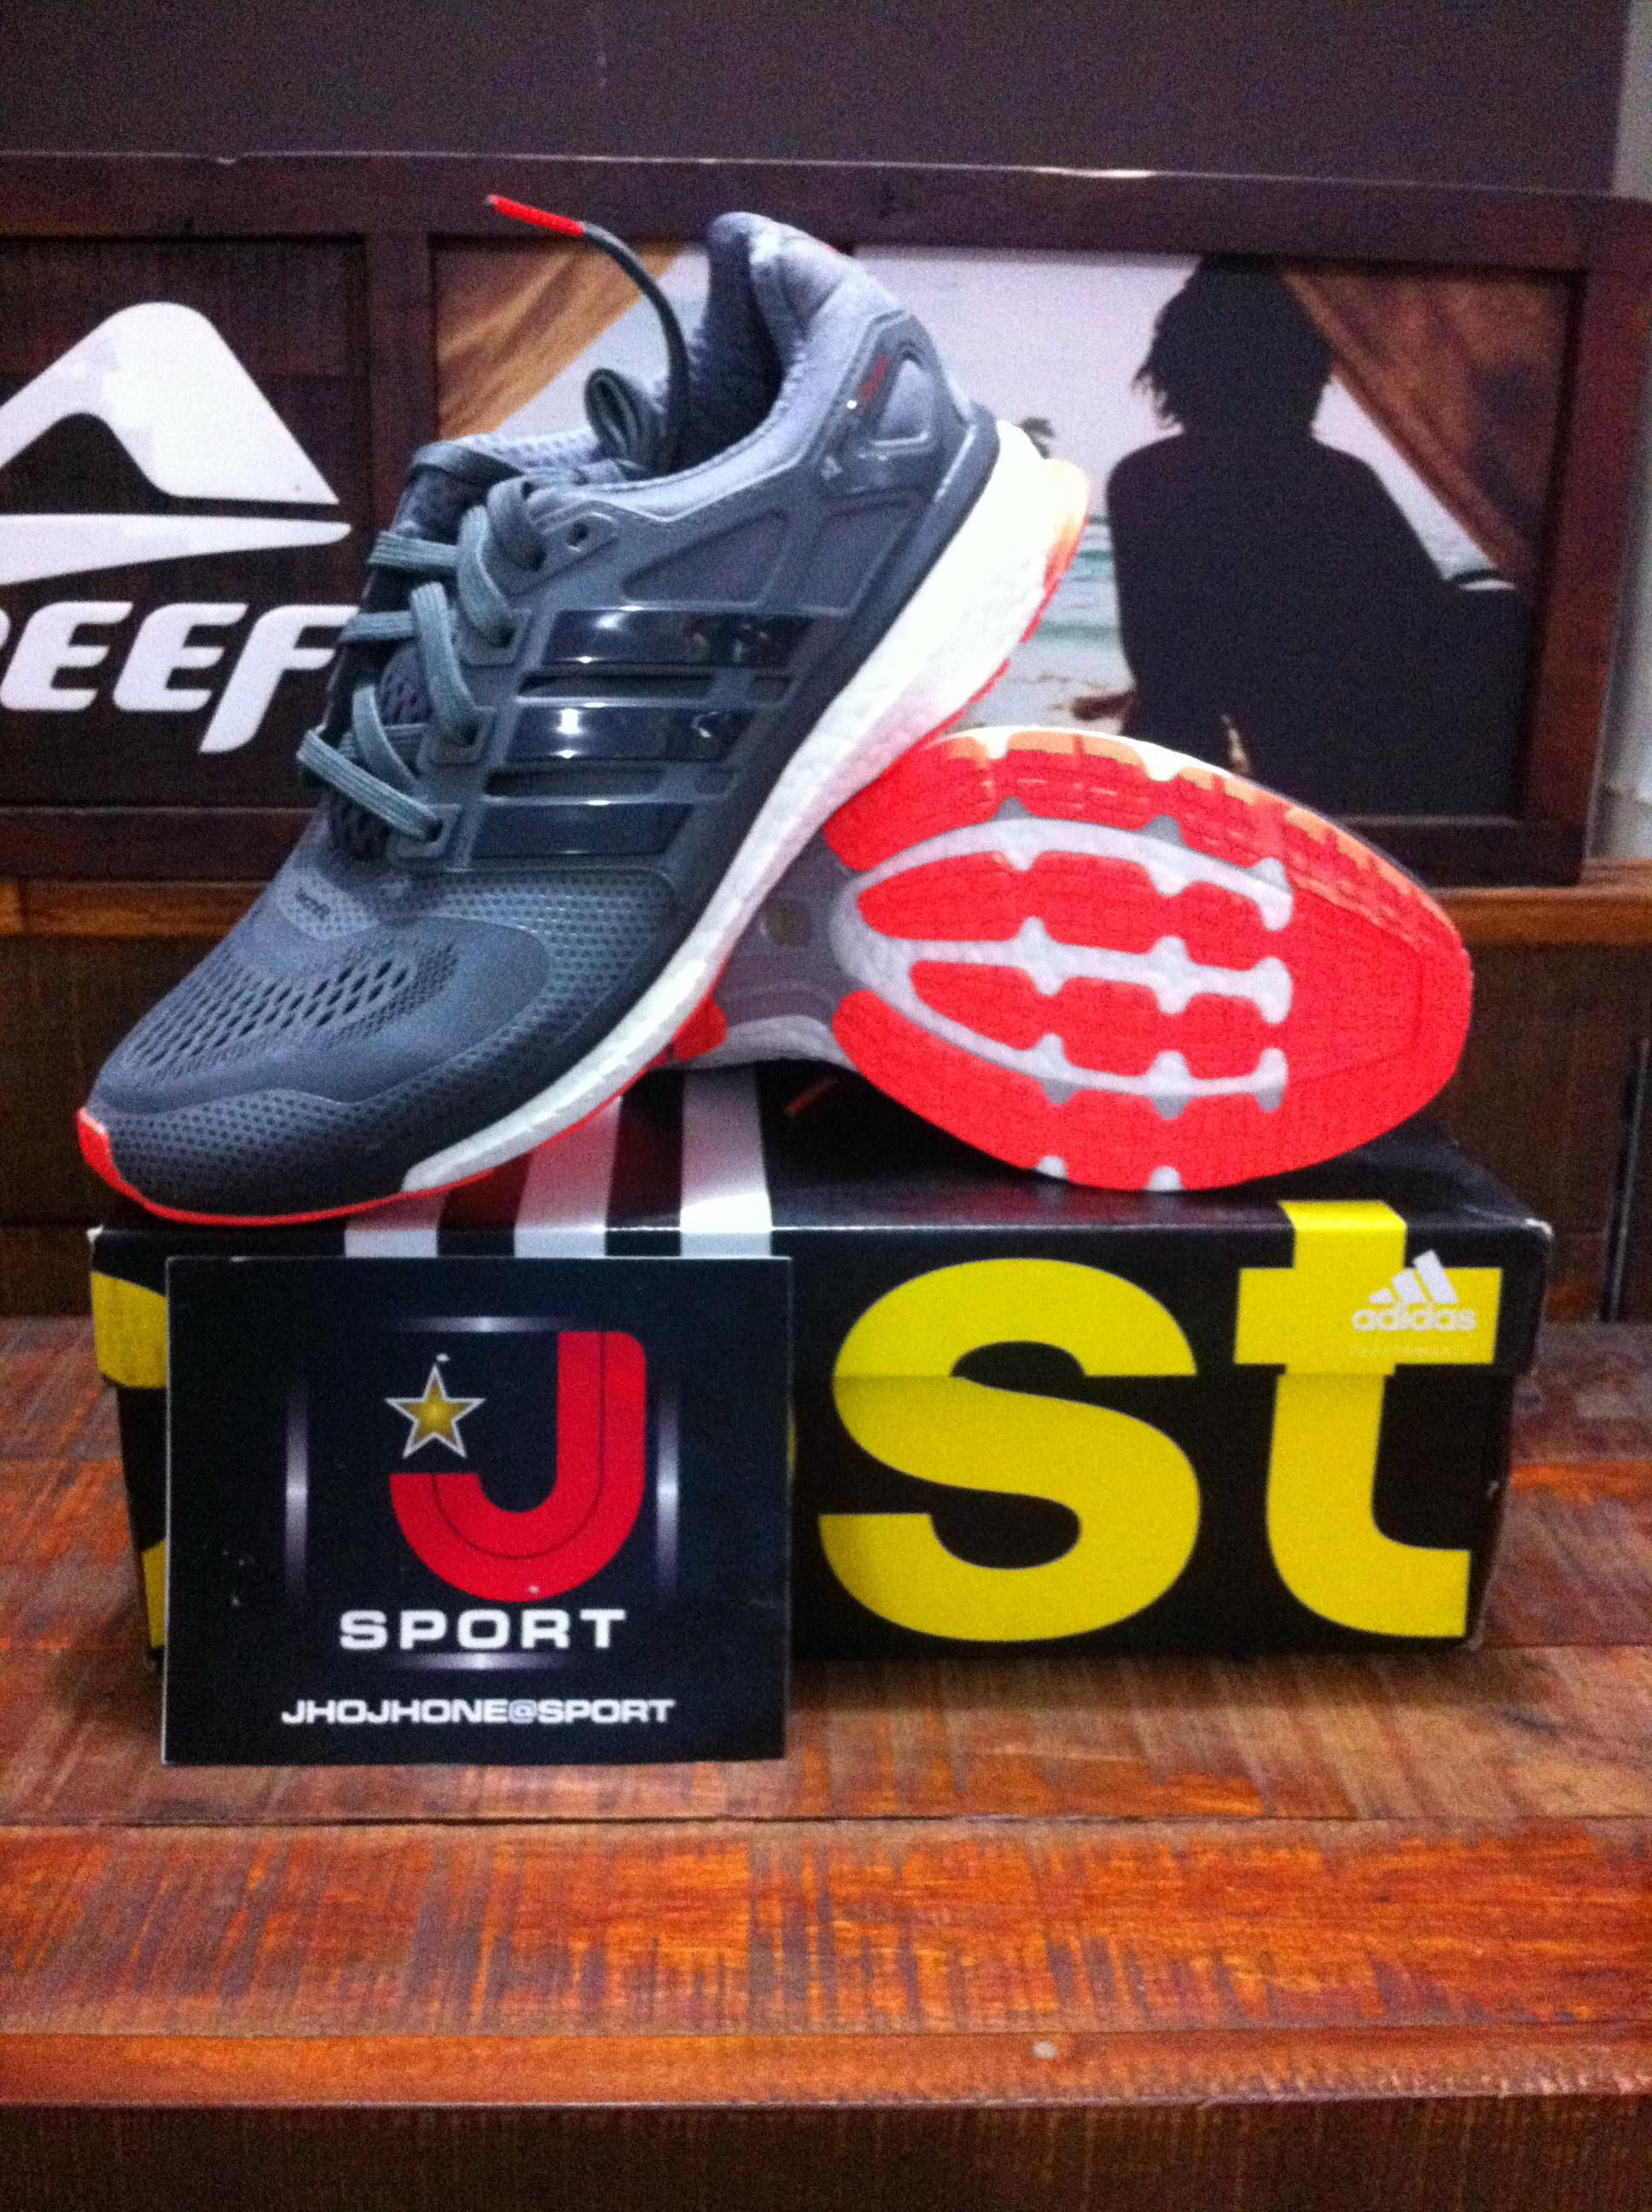 2869f3f9a usa jual adidas energy boost esm art b44285 jhojonesport tokopedia 445e3  e82f1